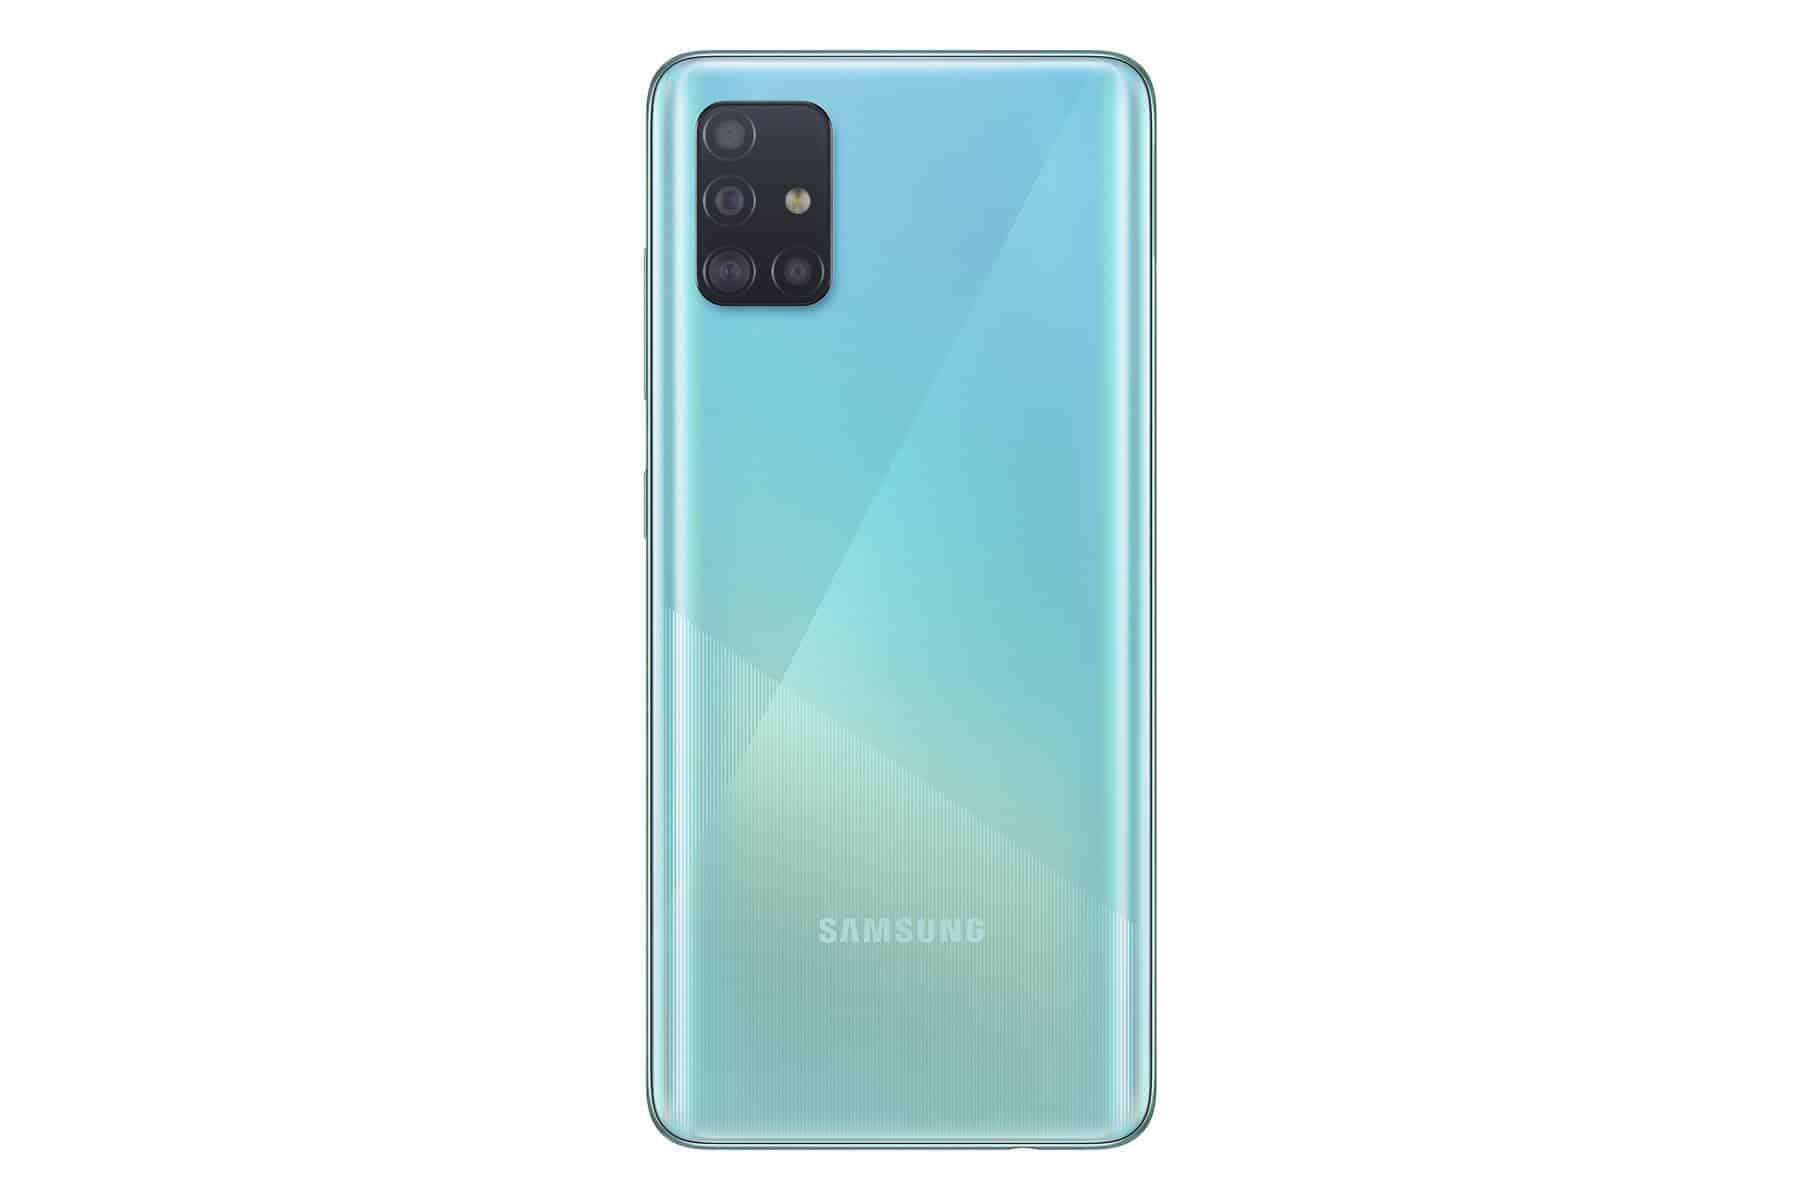 Galaxy A51 image 18